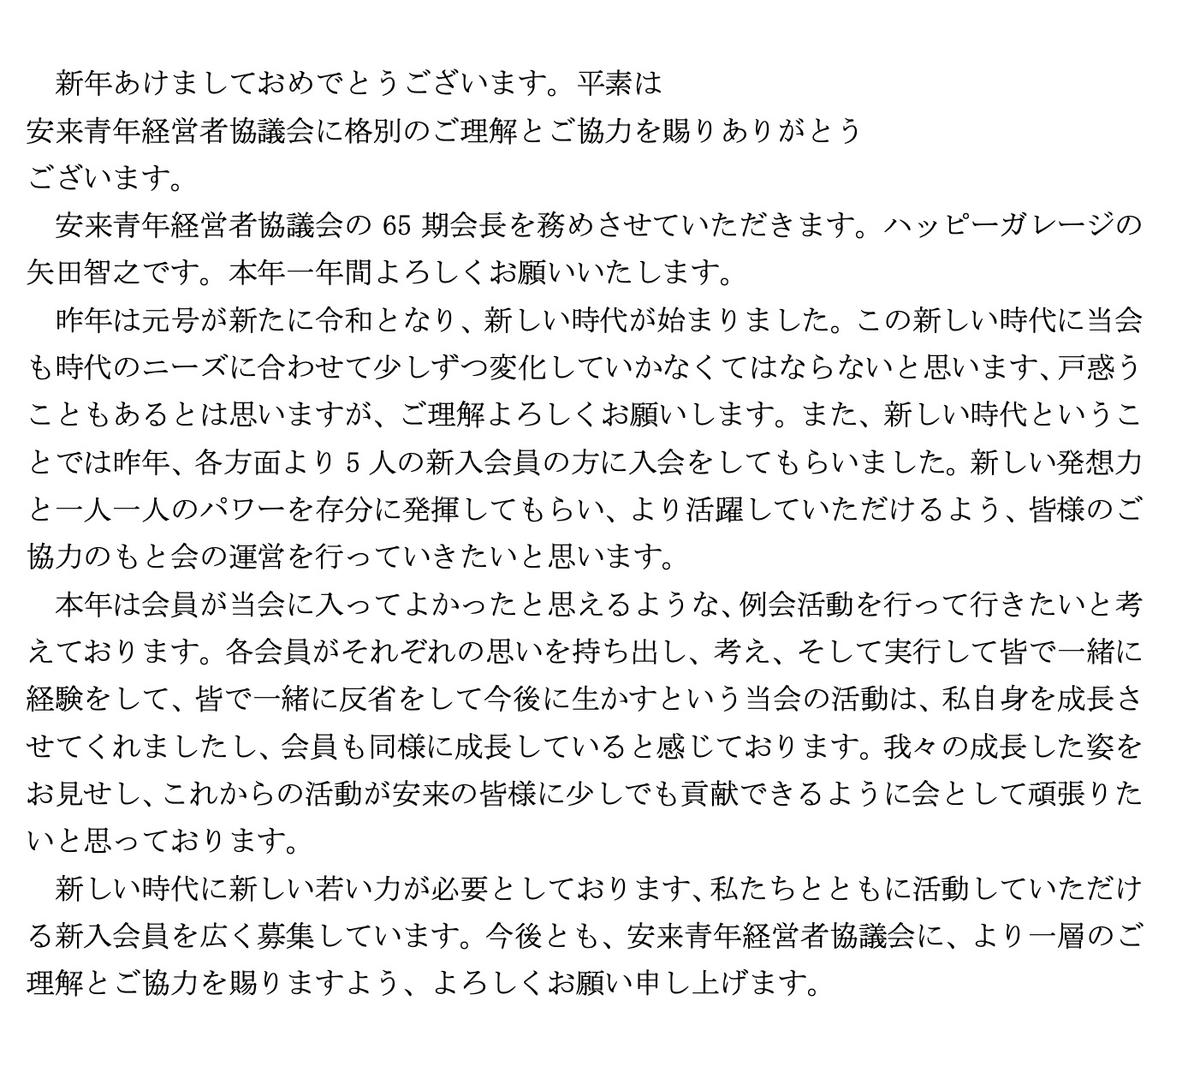 f:id:yasugi-seikei:20200219170337j:plain